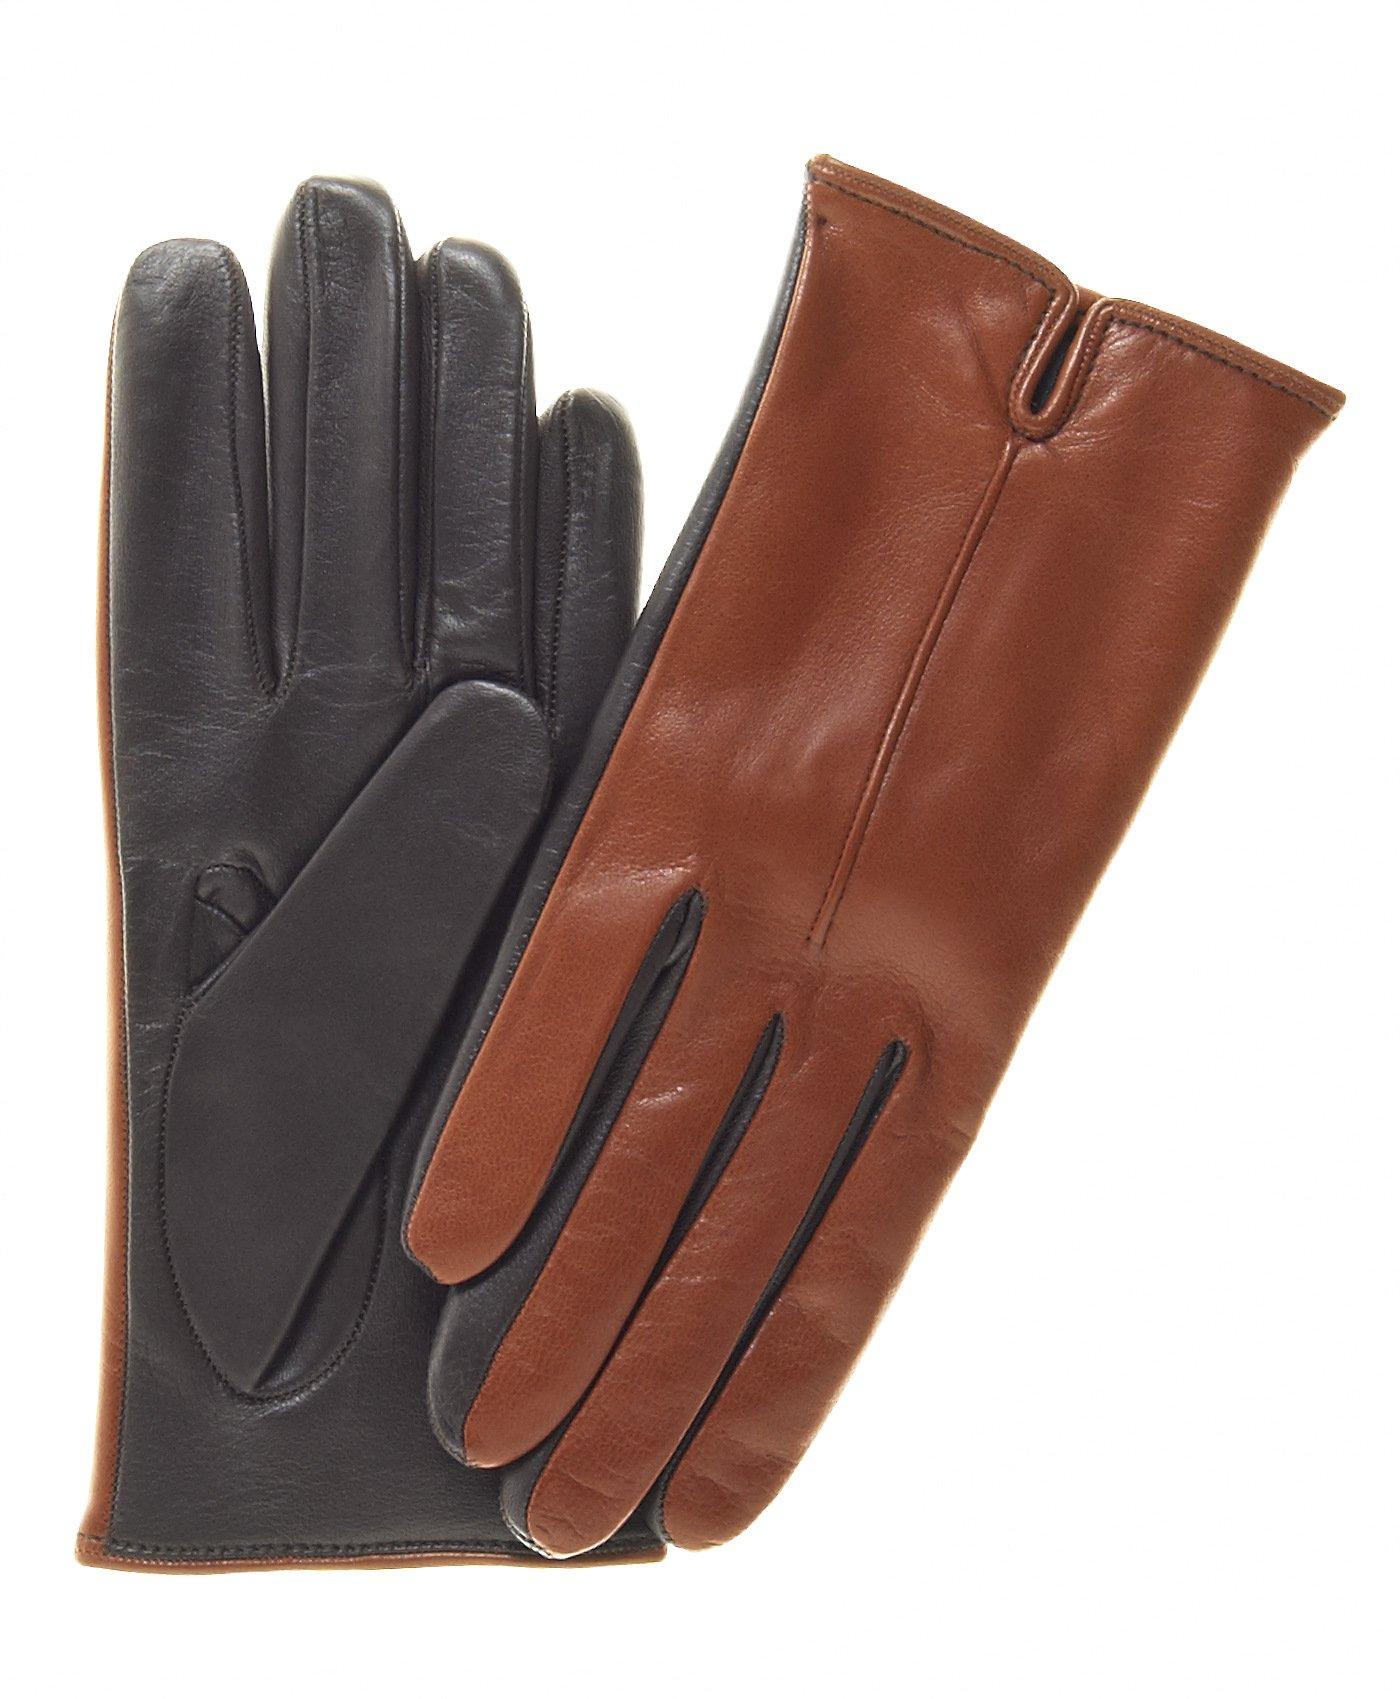 Fratelli Orsini Women's Touchscreen Italian Cashmere Lined Leather Gloves Size 8 Color Medbrn/Drkbrn